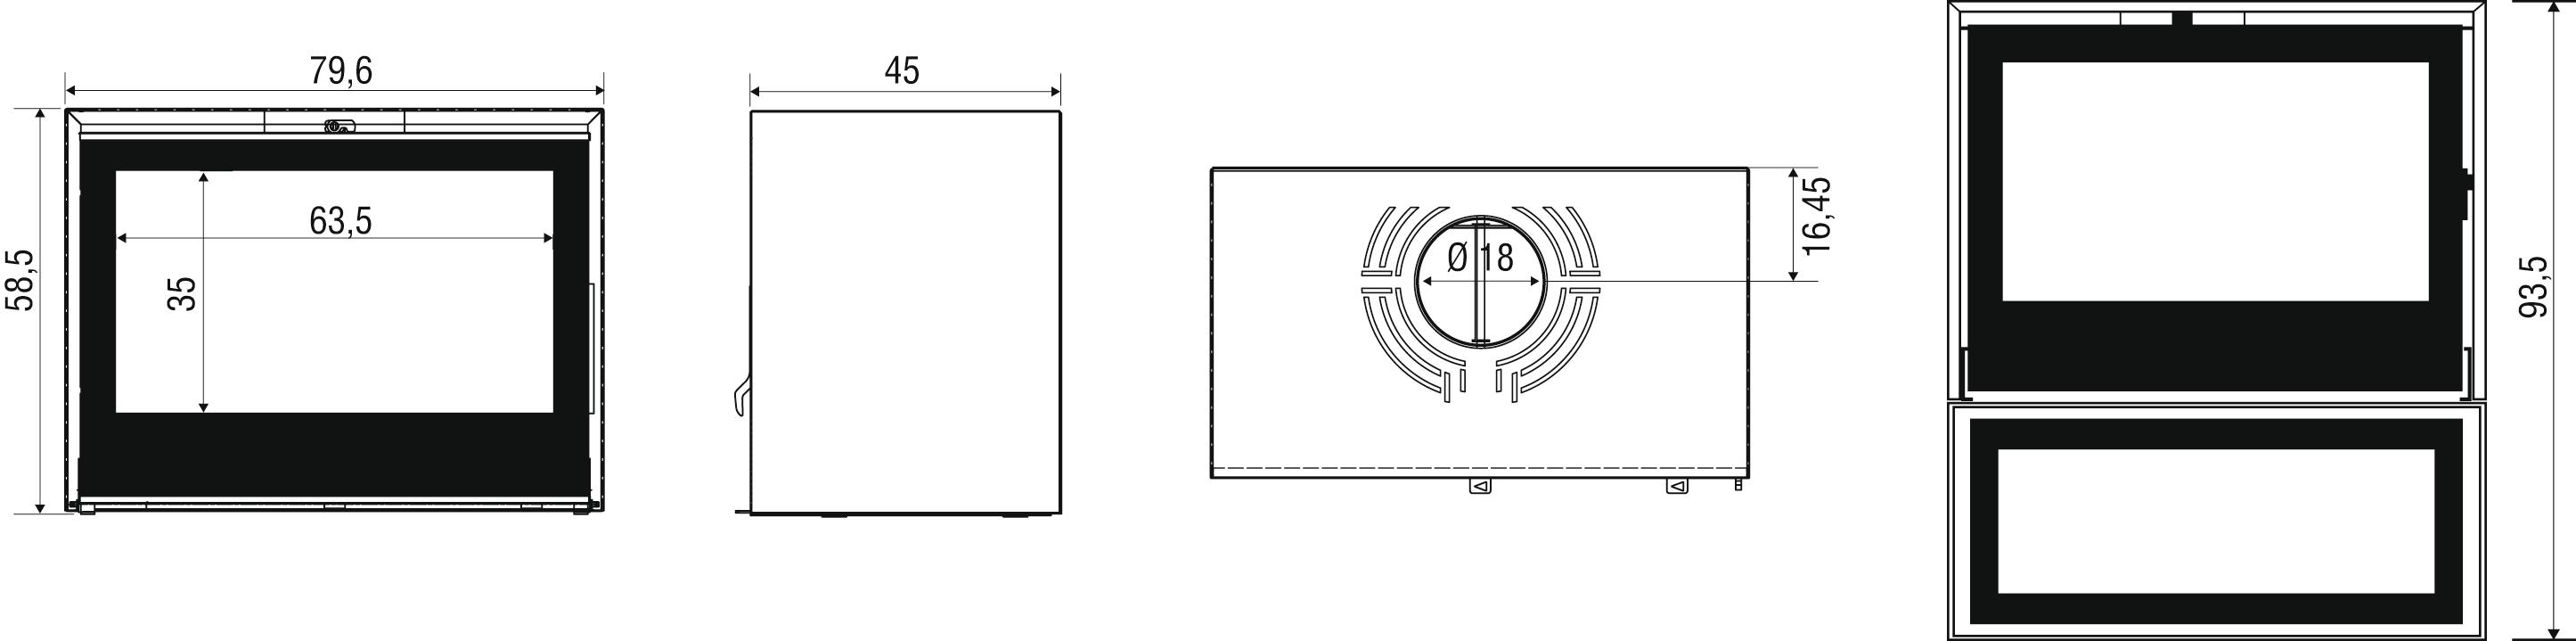 Cheminées Design AXIS schema I800P